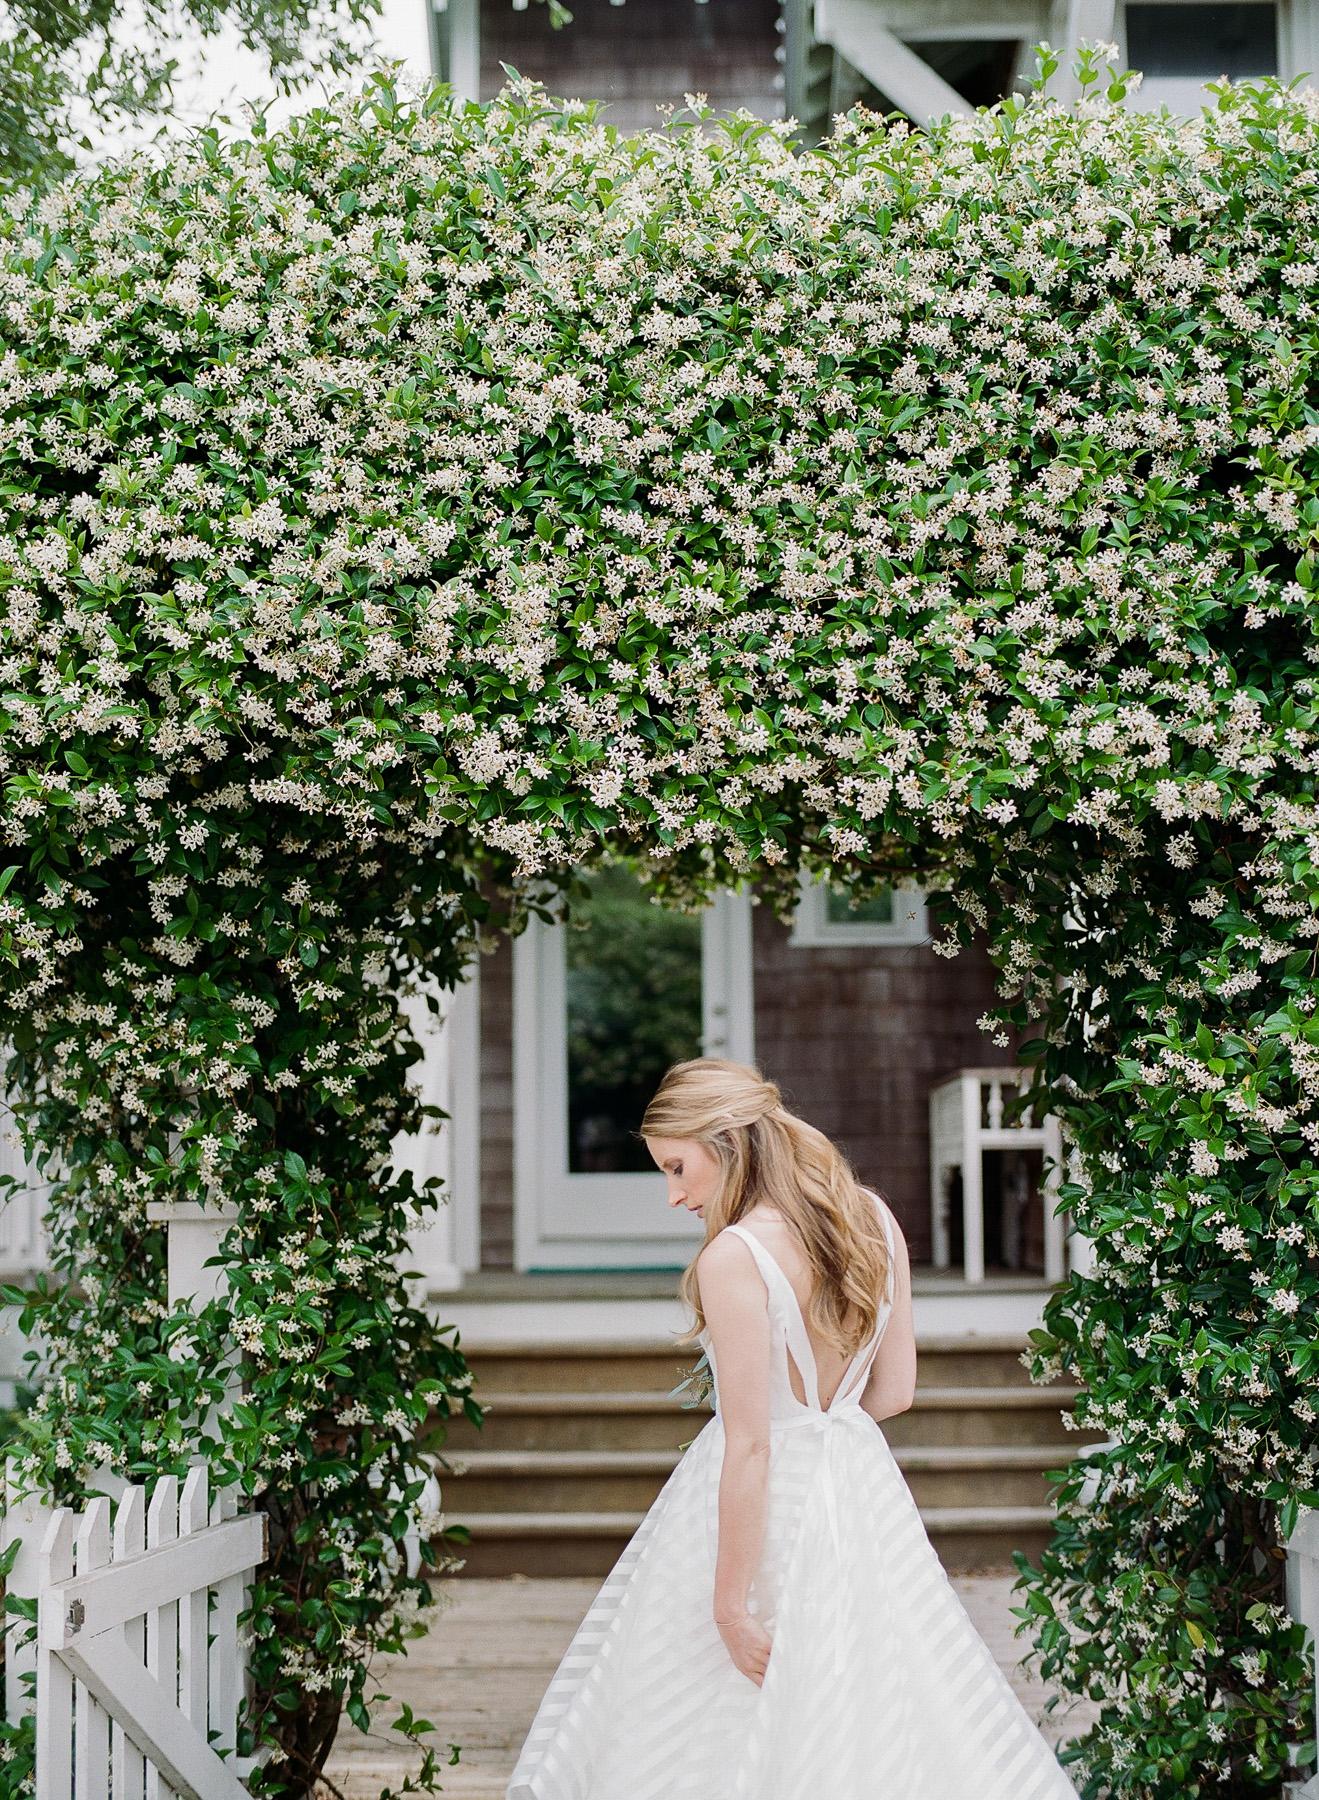 NC-wedding-photographer-best-03.jpg